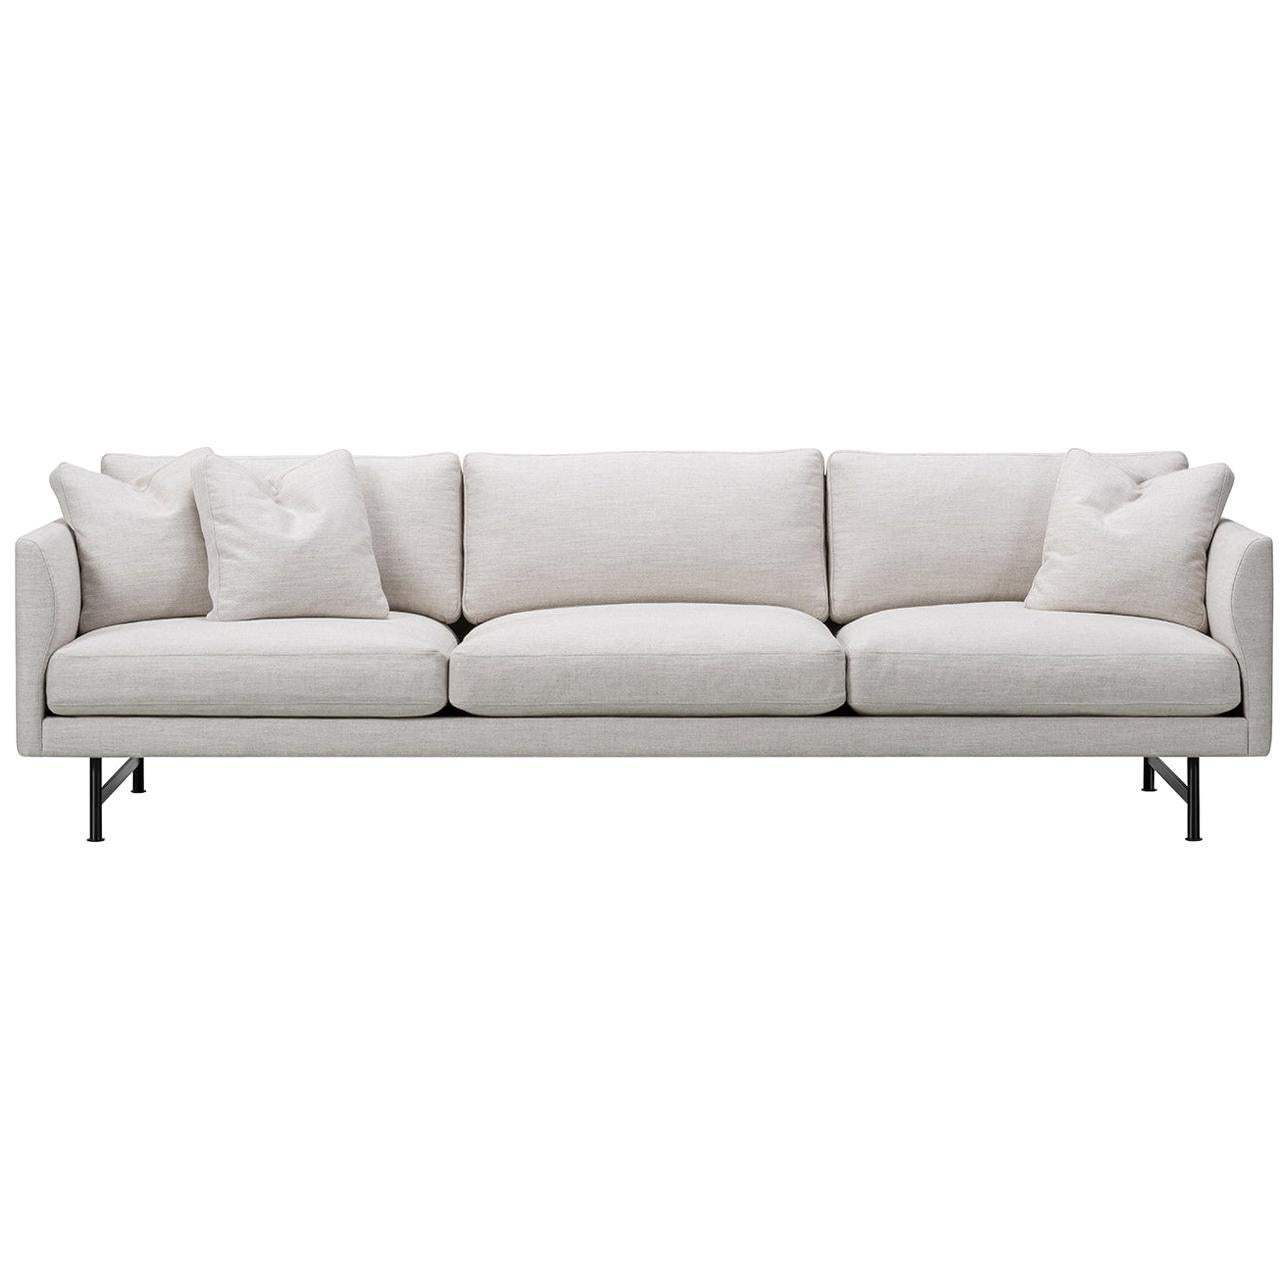 Hugo Passos Calmo Sofa 80, 3-Seater, Metal Base